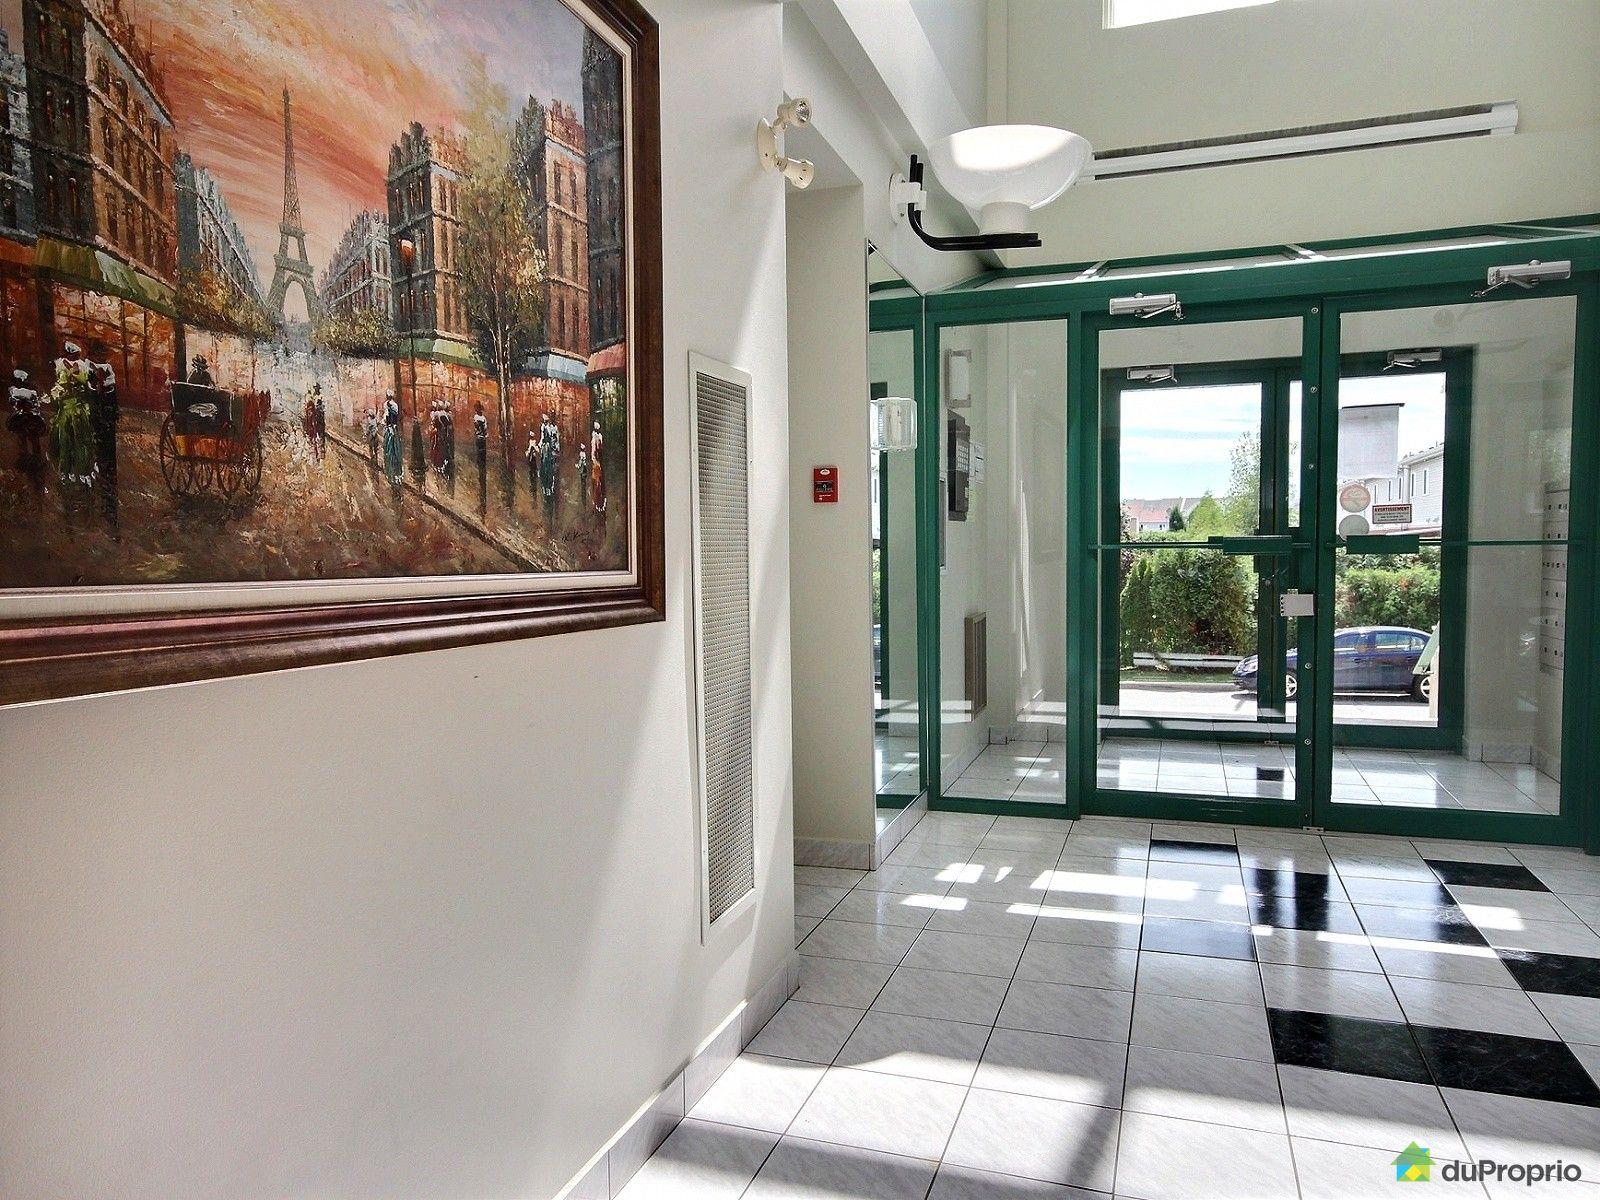 Condo vendre brossard 104 9240 rue riverin immobilier for Golf interieur brossard